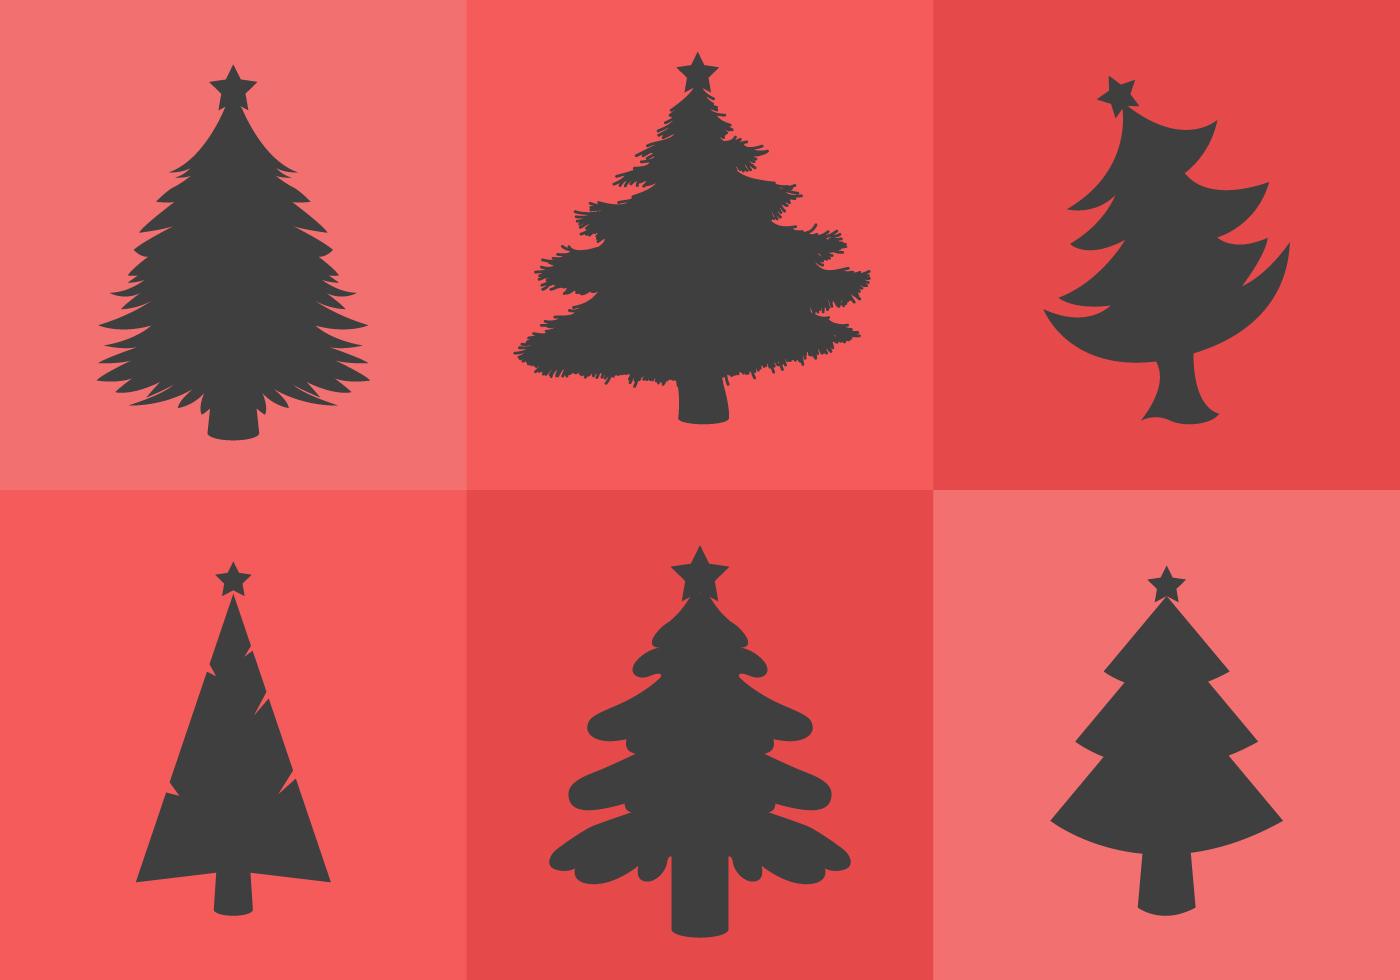 Christmas tree silhouettes